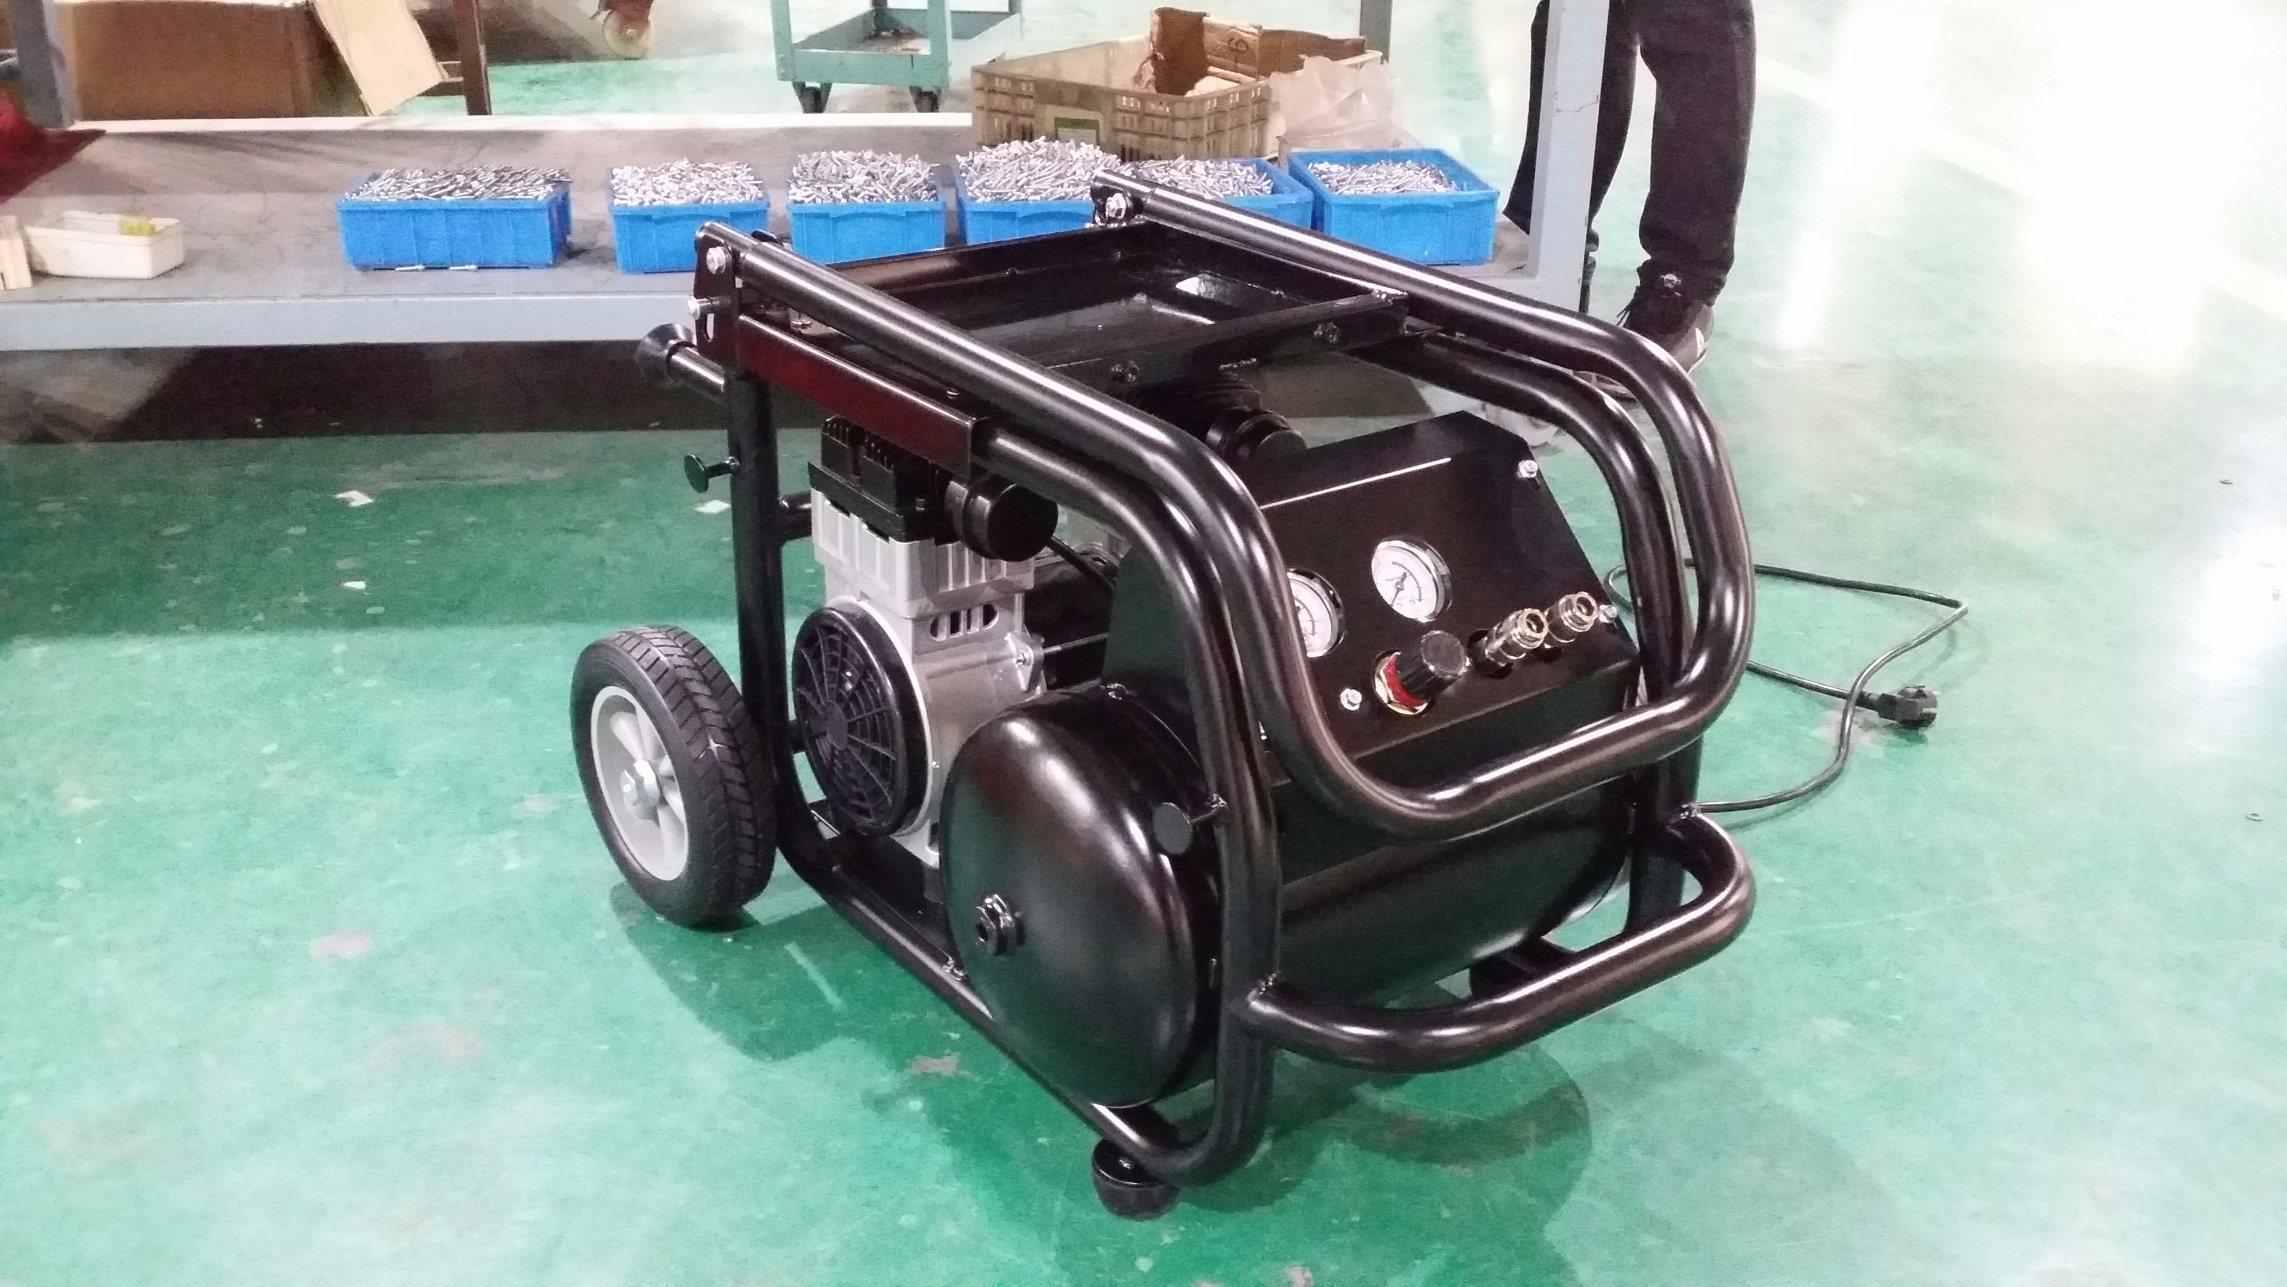 Tat-2520p Oil- Free Silent 2.0HP Manumotive Air Compressor (2.5HP 20L)